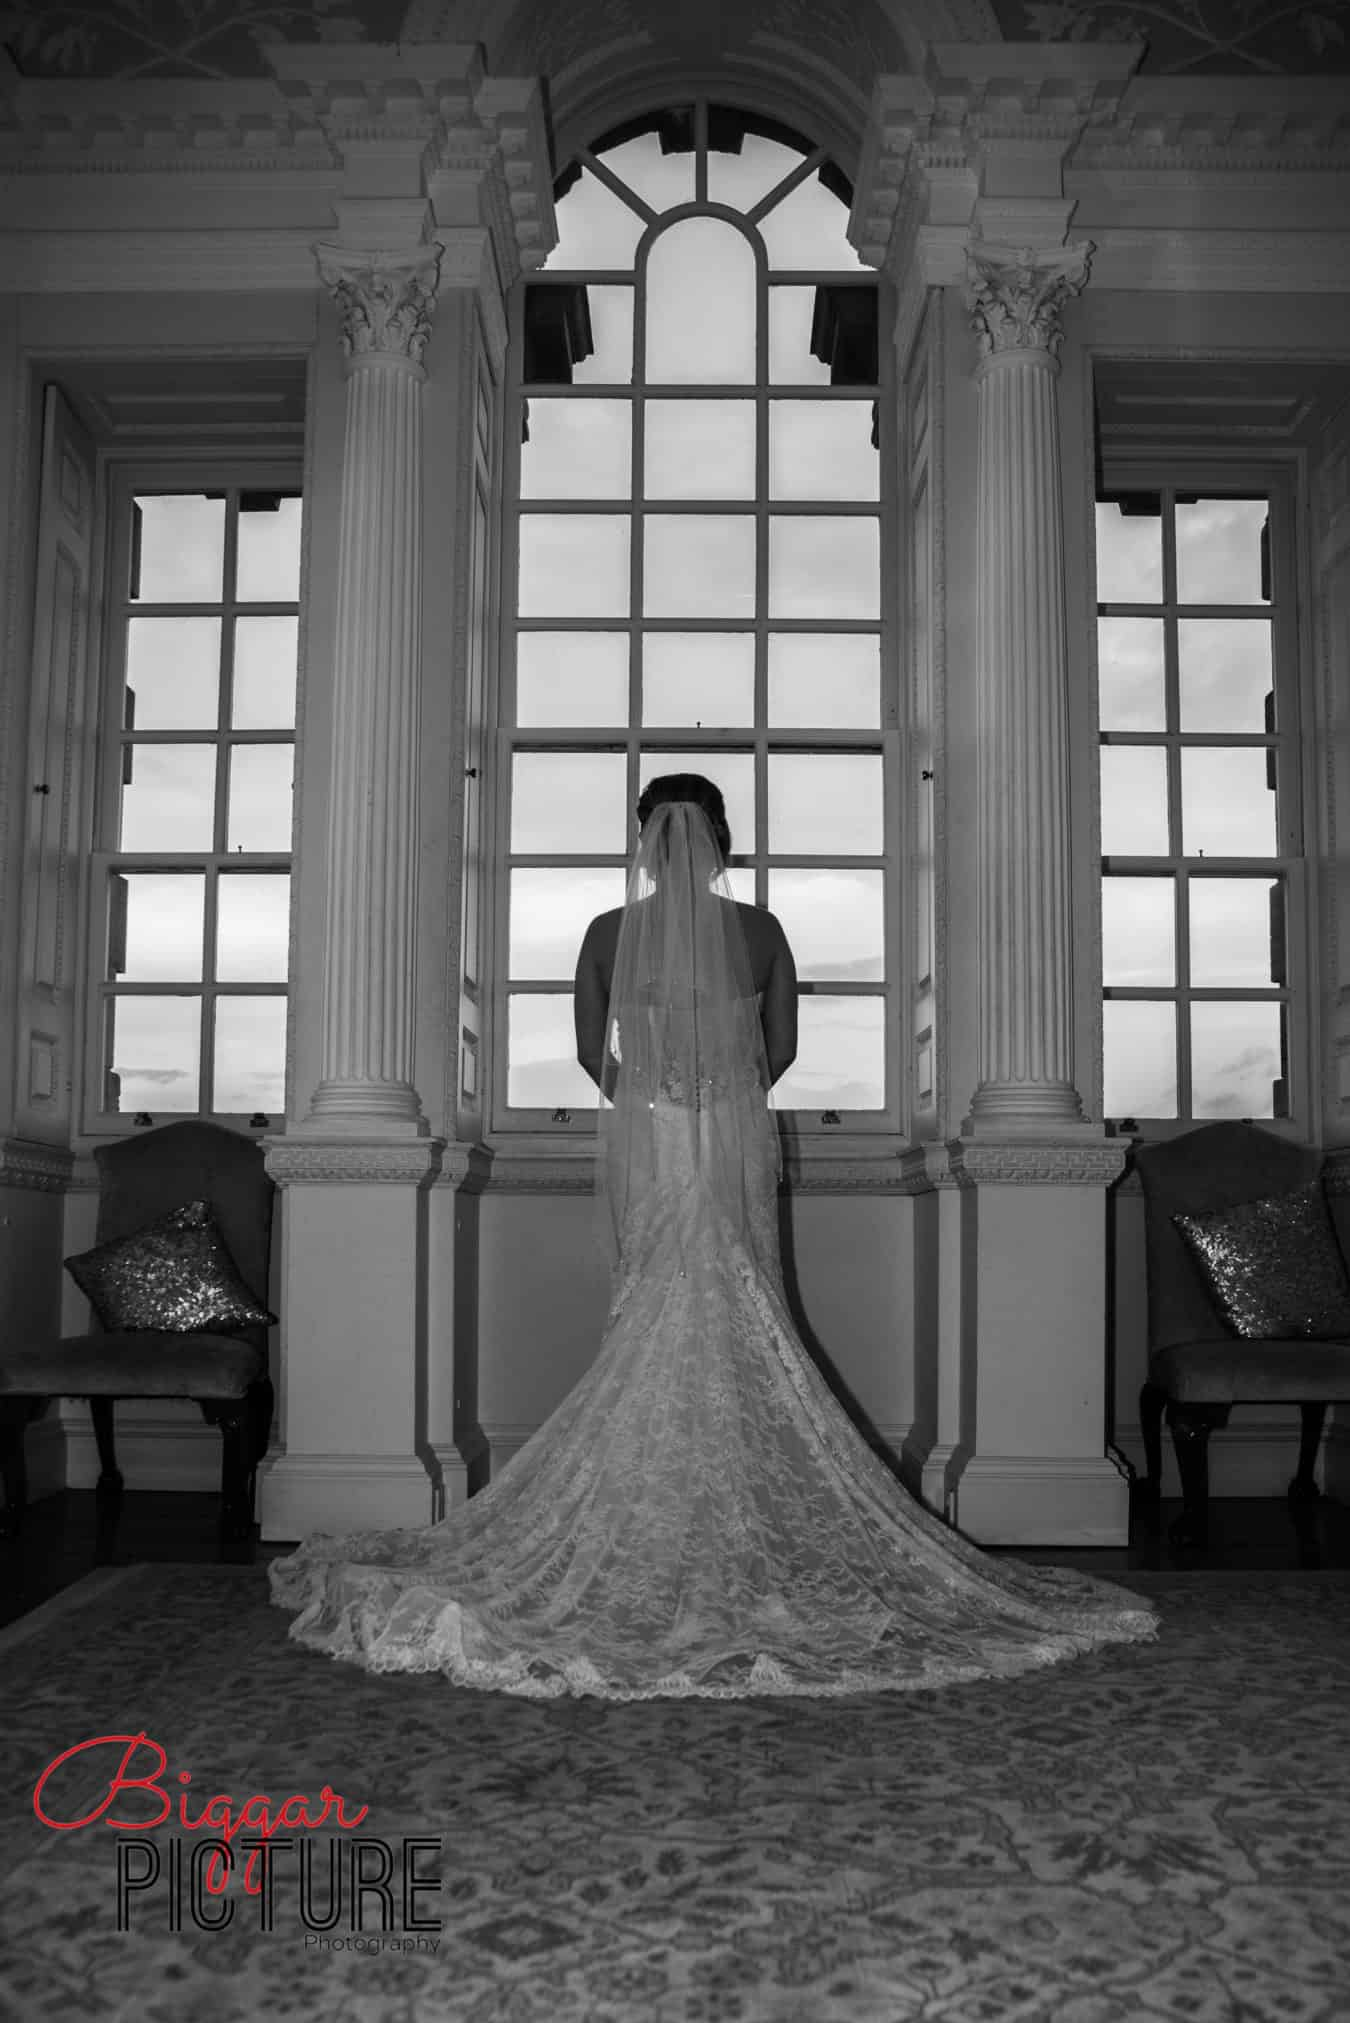 biggar-picture-scottish-central-scotland-wedding-photographer-bride-dress